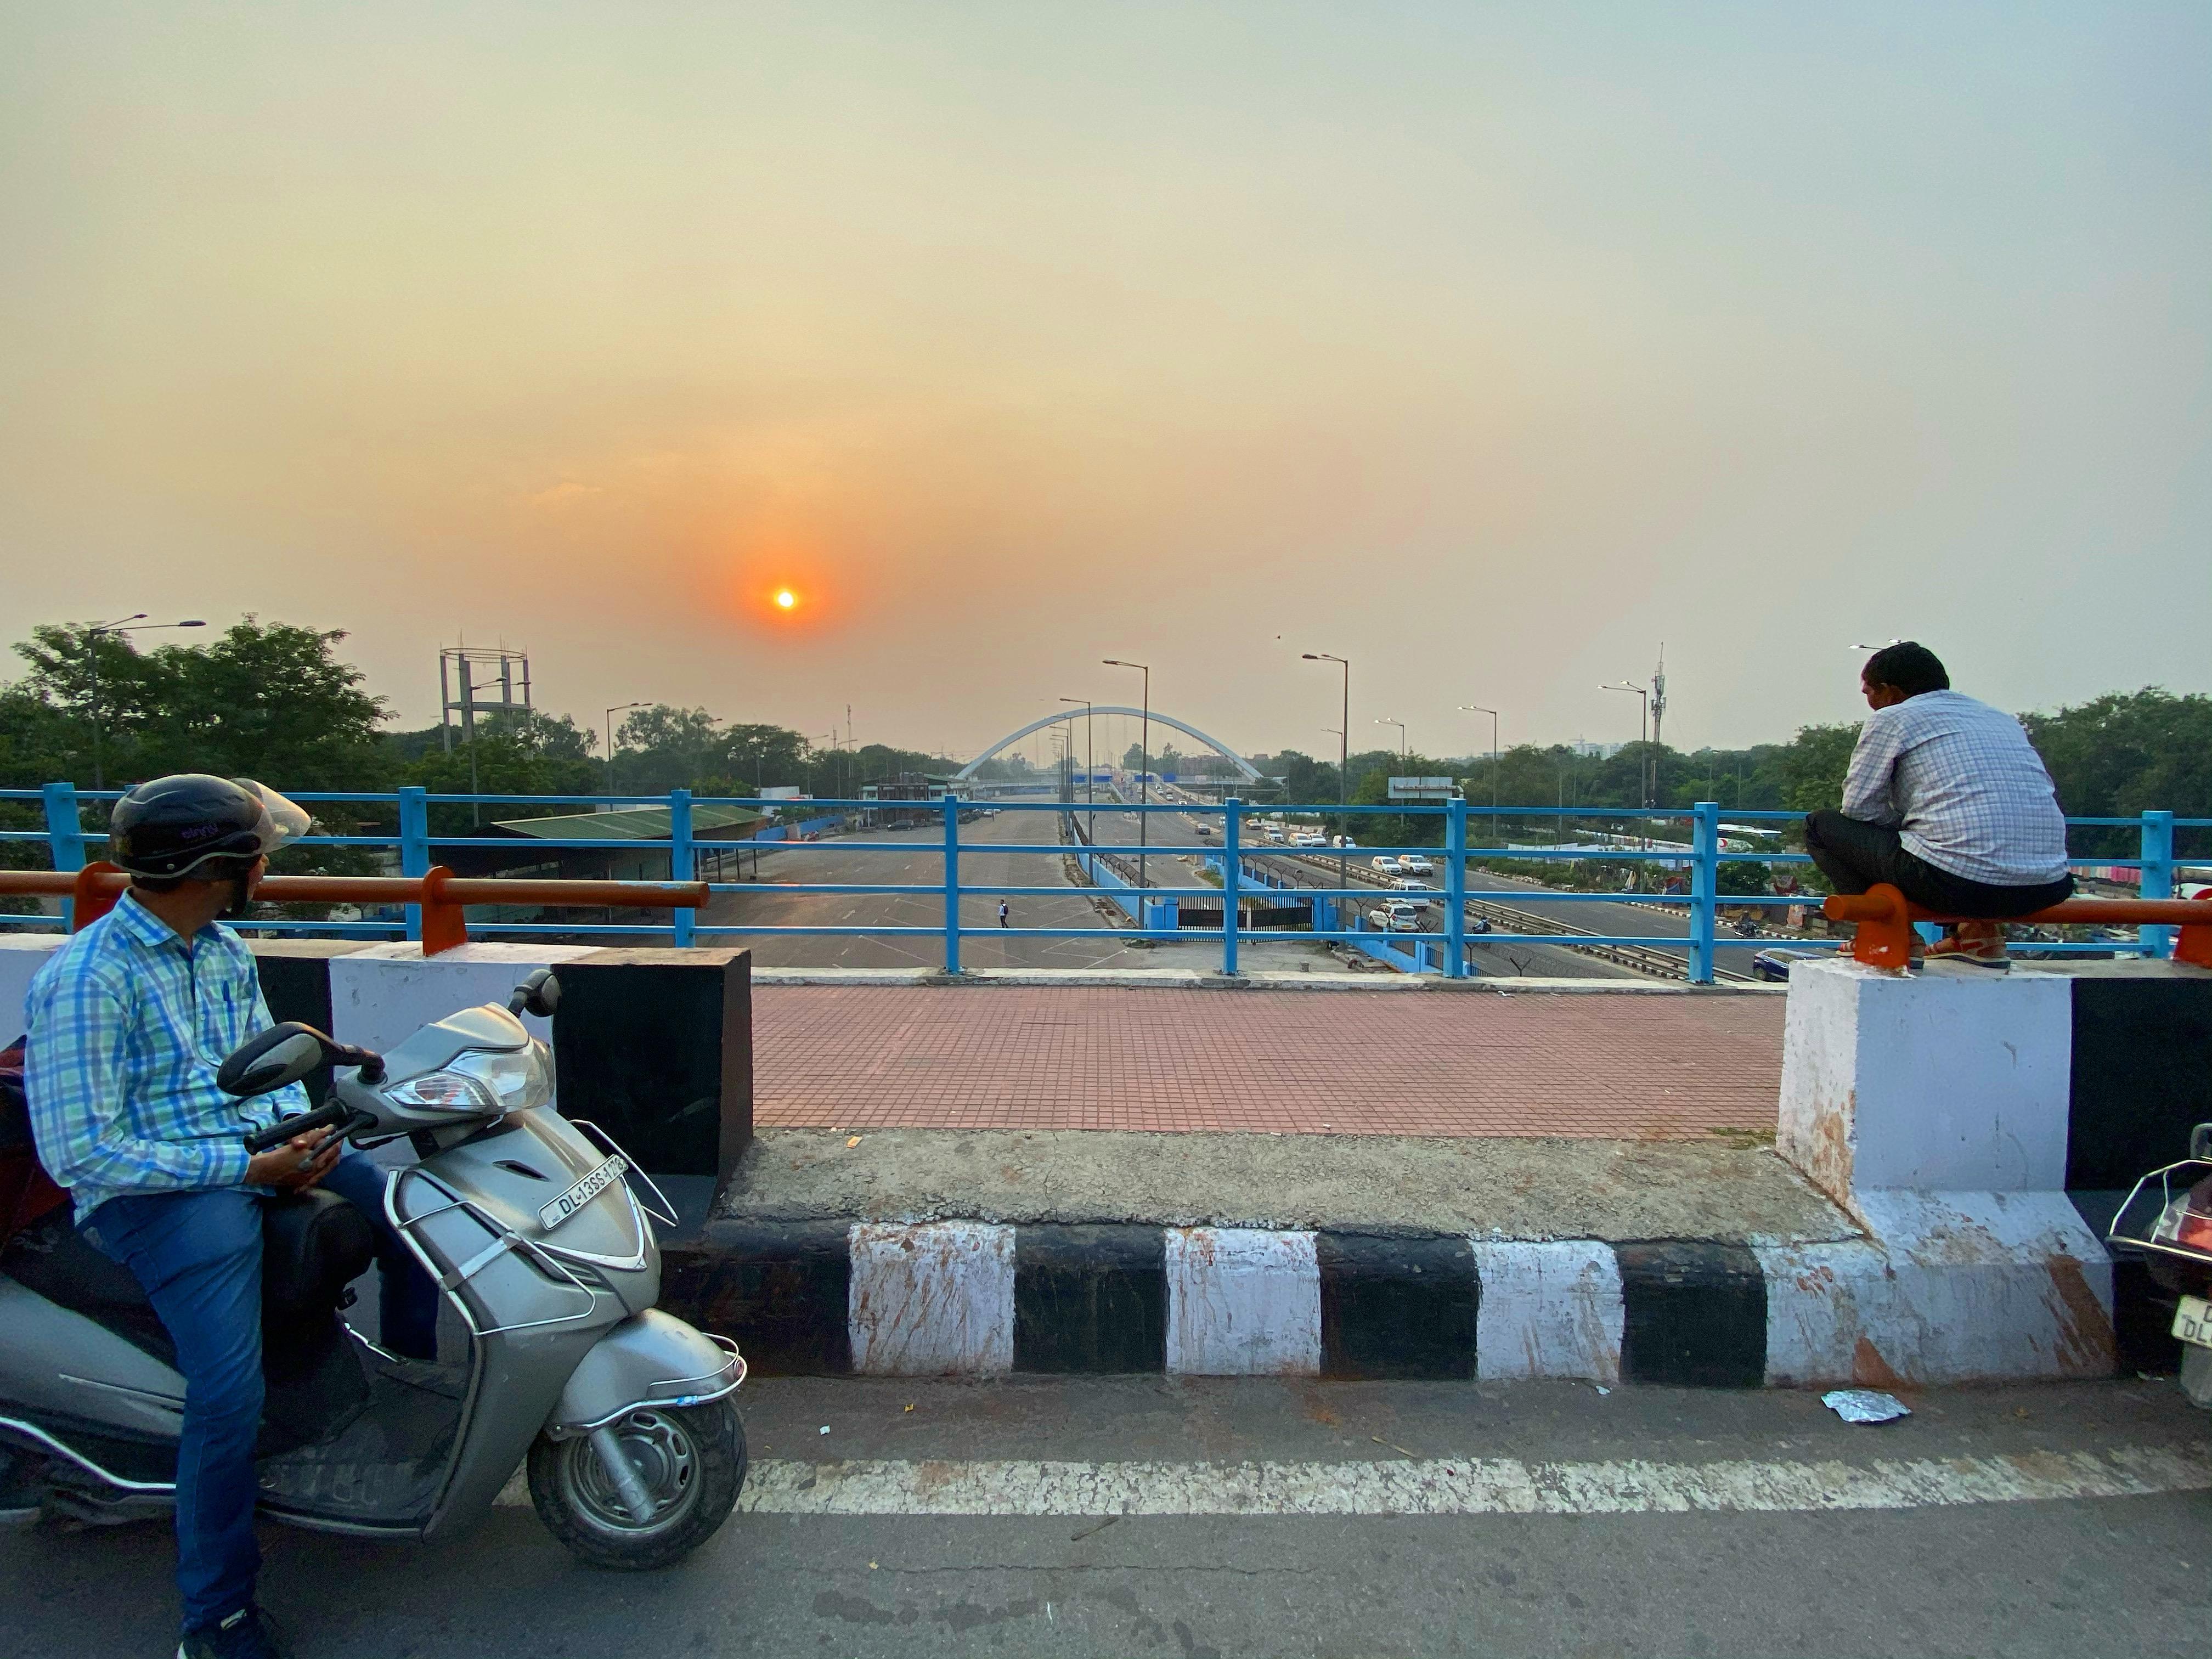 City Hangout Flyover Sunset Bhishma Pitamah Setu The Delhi Walla